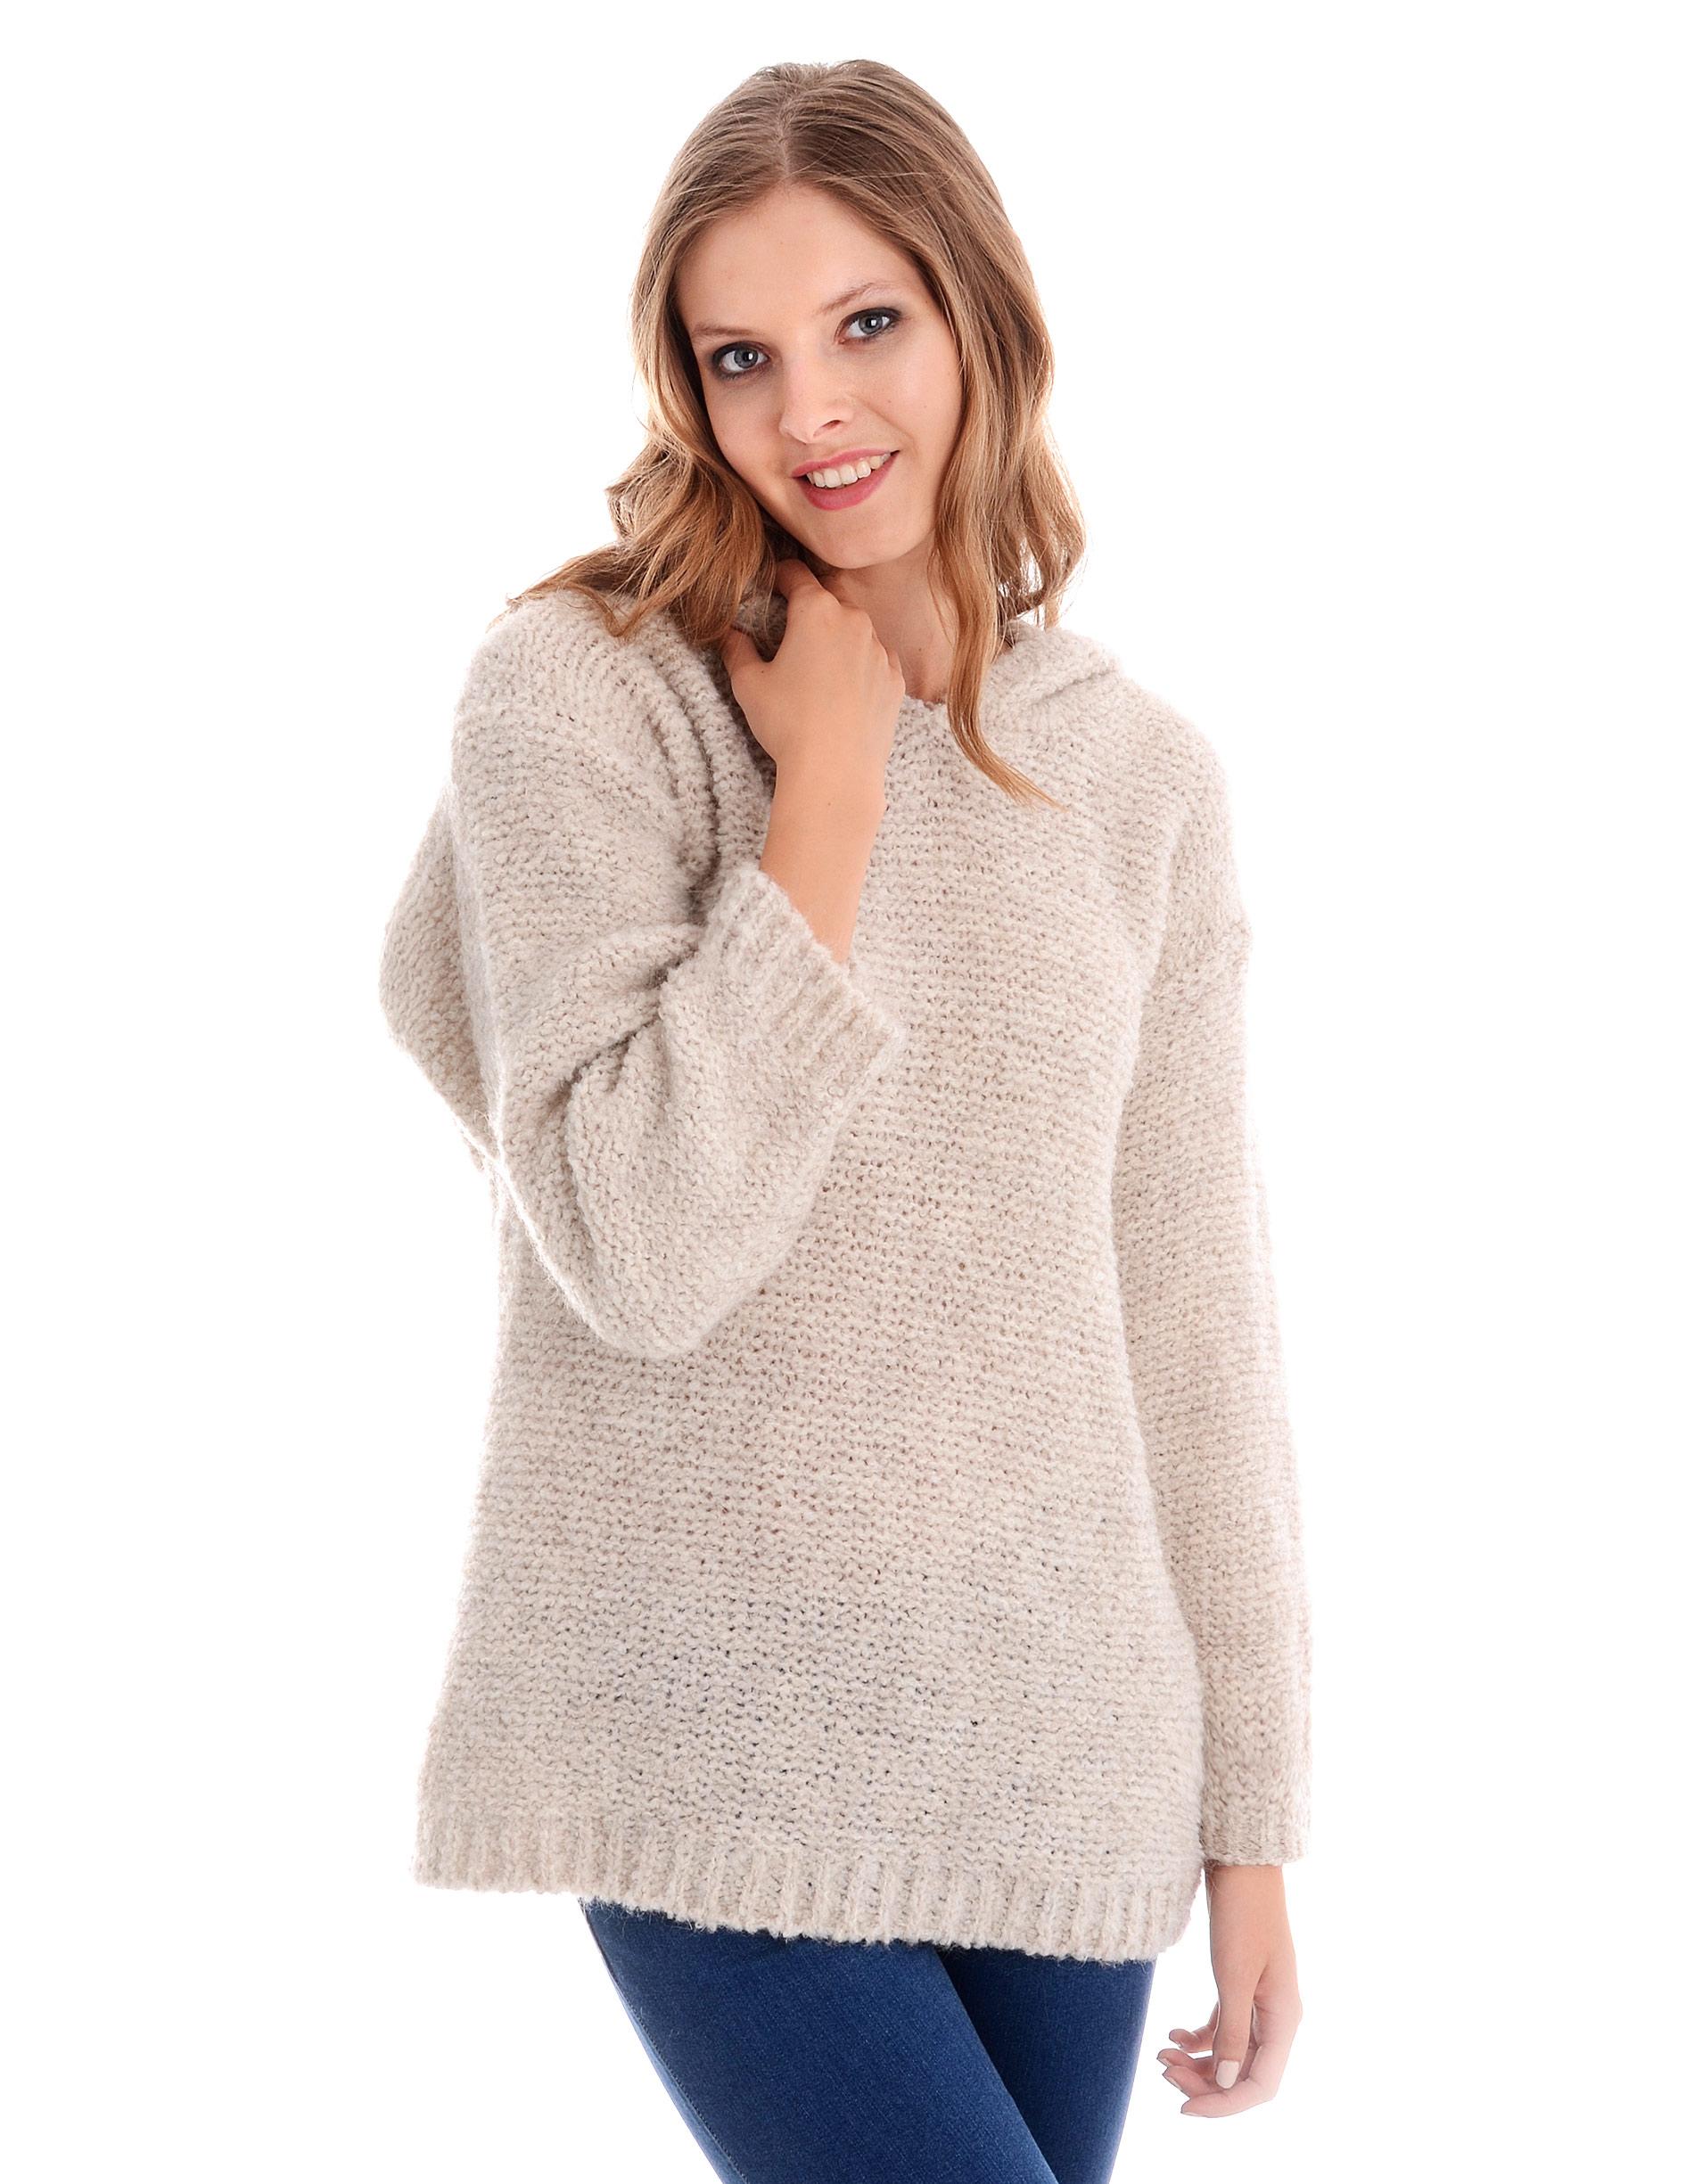 Sweter - 67-15644 BECH - Unisono